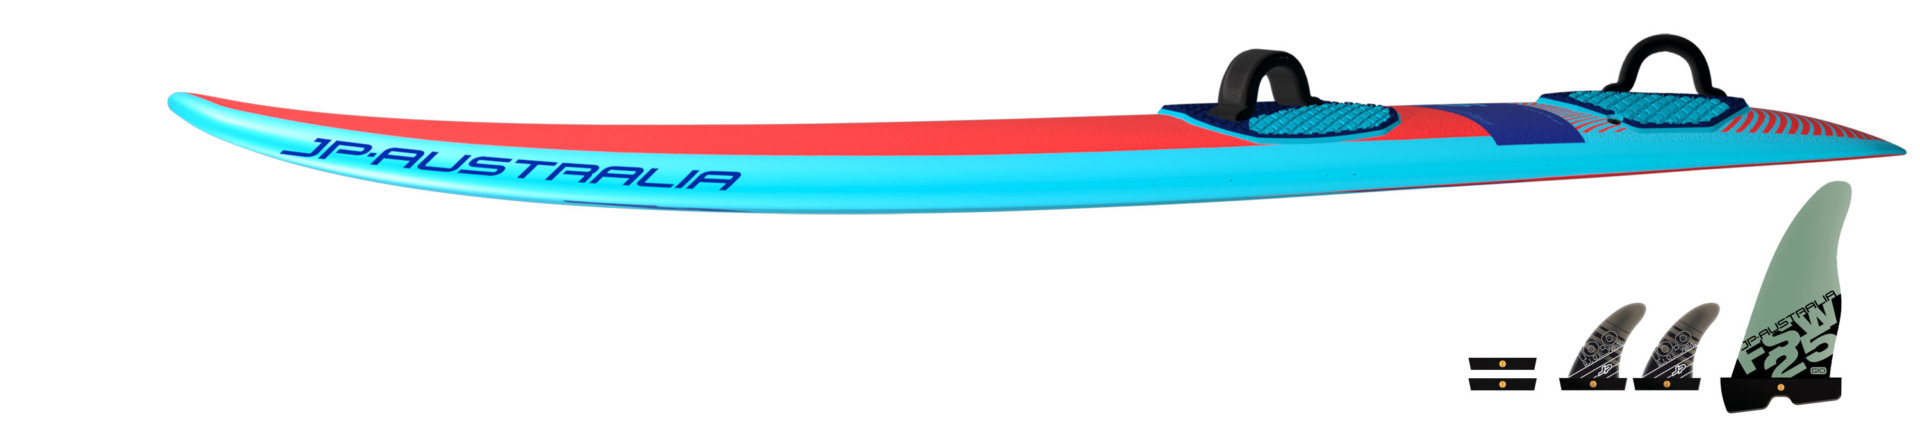 JP Australia Freestyle Wave LXT 2021 rail